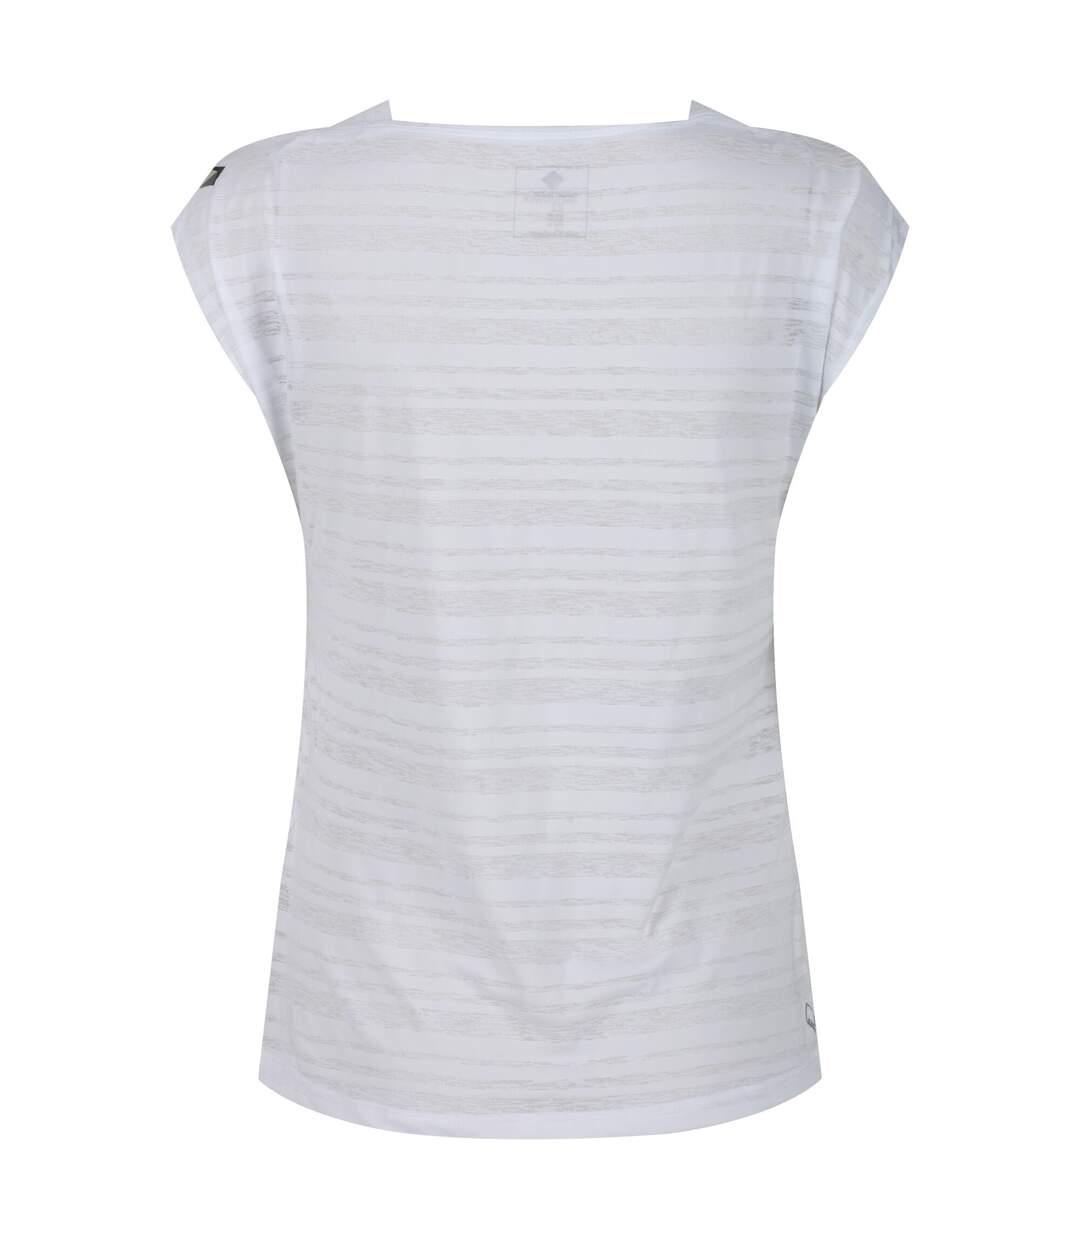 Regatta - T-Shirt Manches Courtes Limonite - Femme (Blanc) - UTRG4248